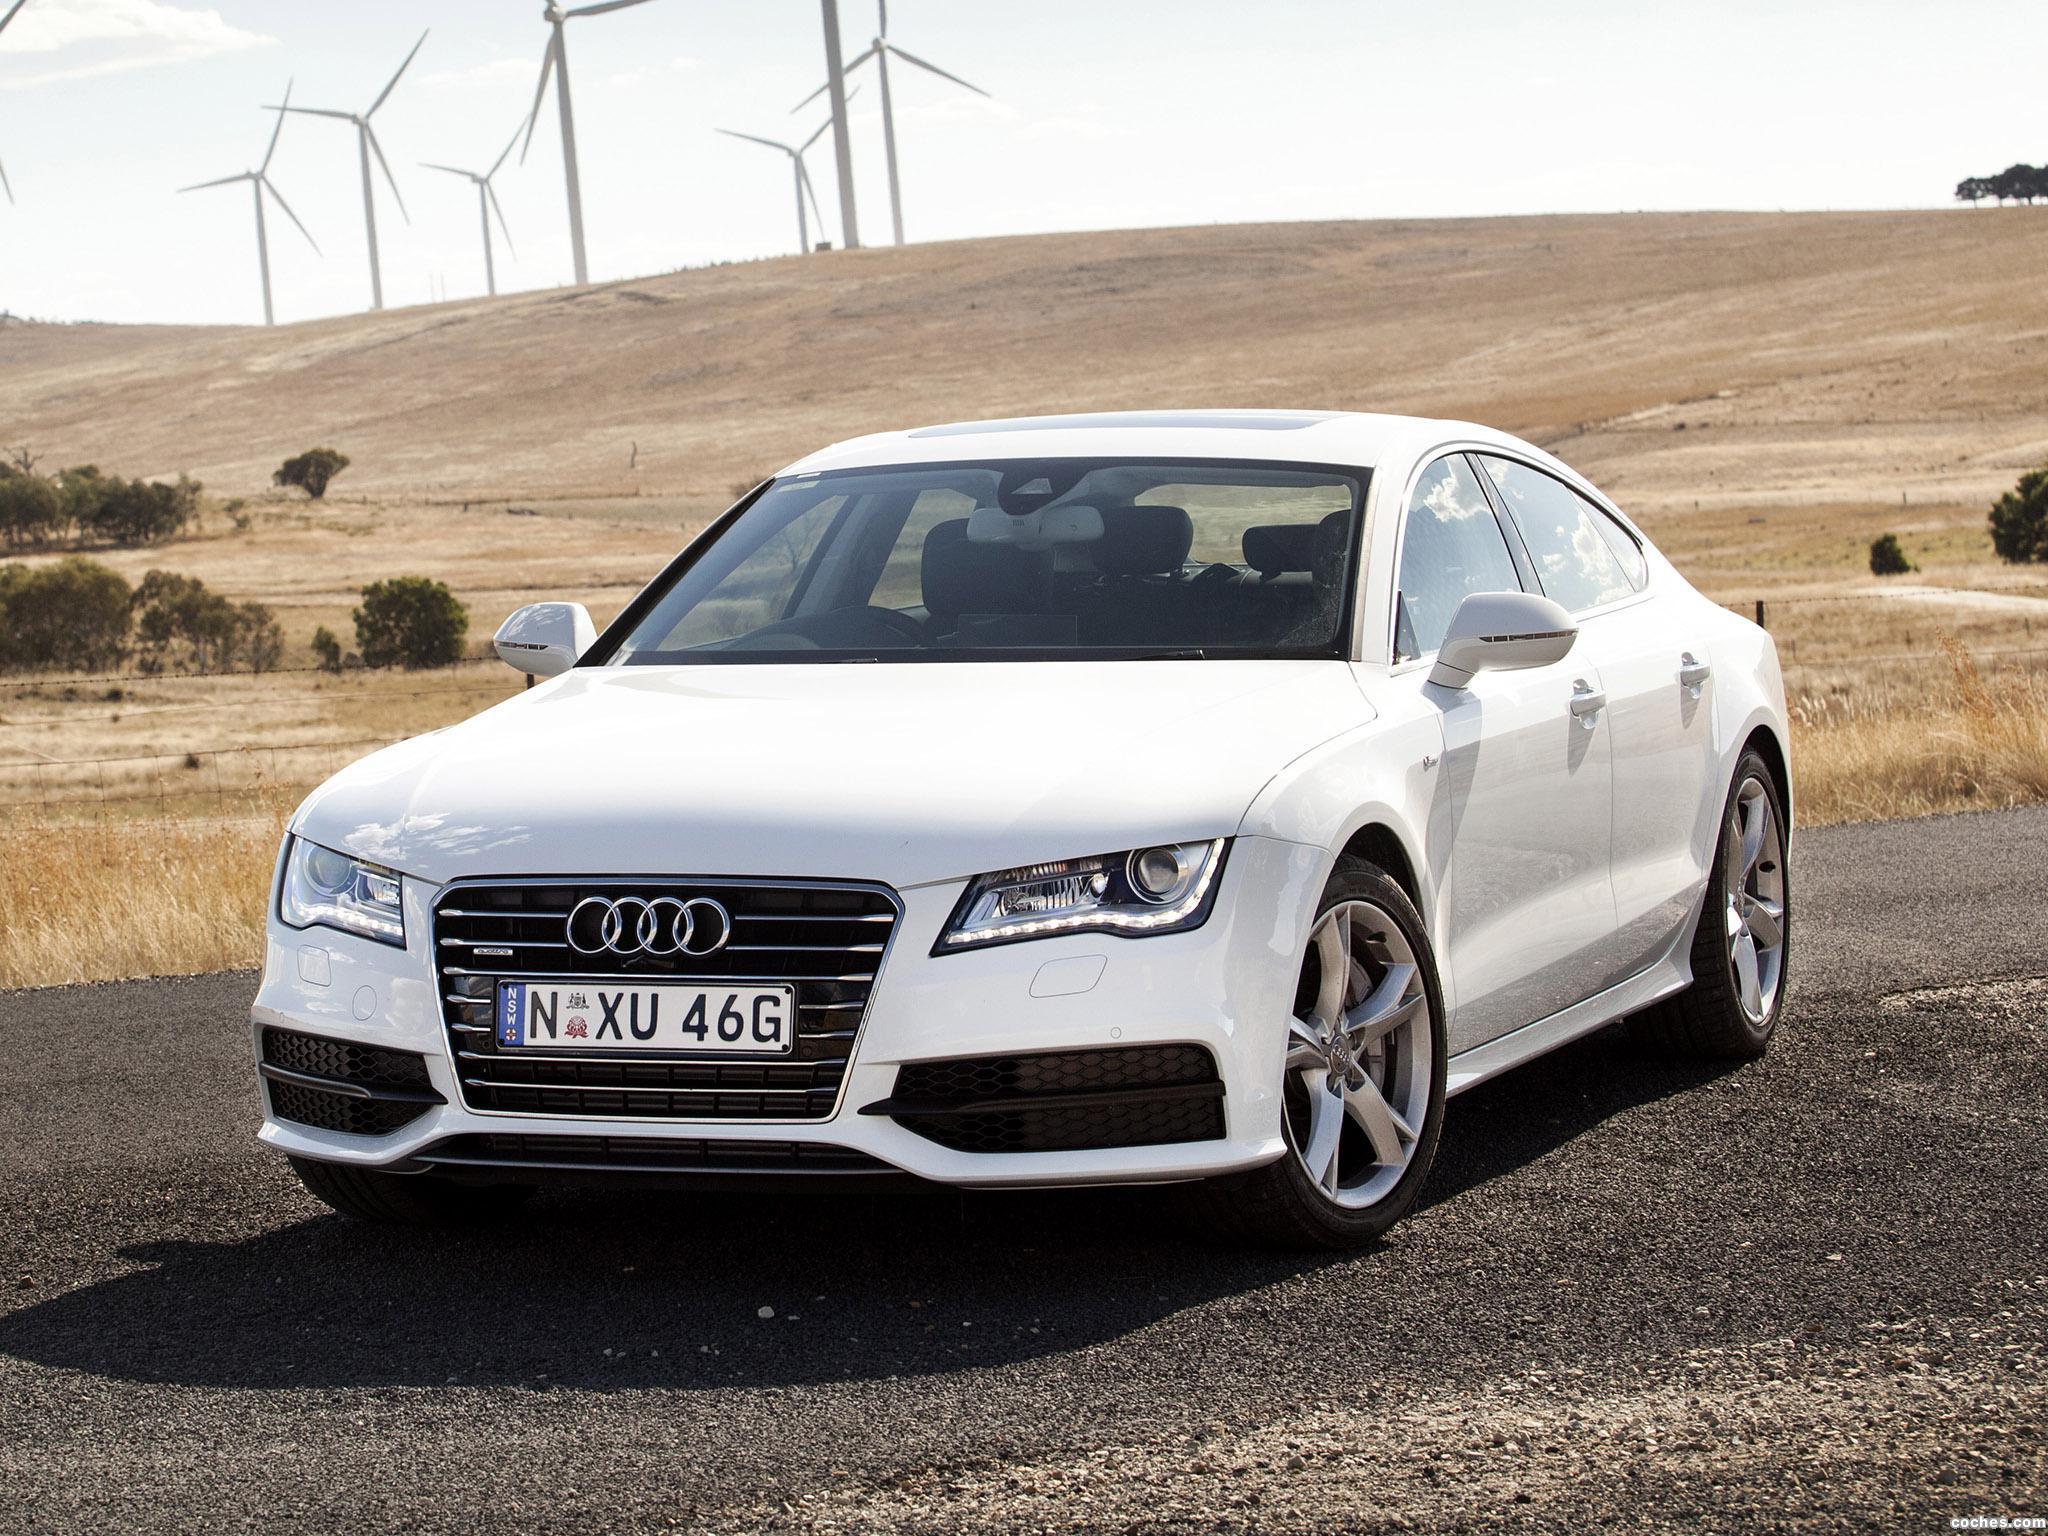 Foto 0 de Audi A7 Sportback 3.0 Biturbo Quattro S-Line Australia 2013